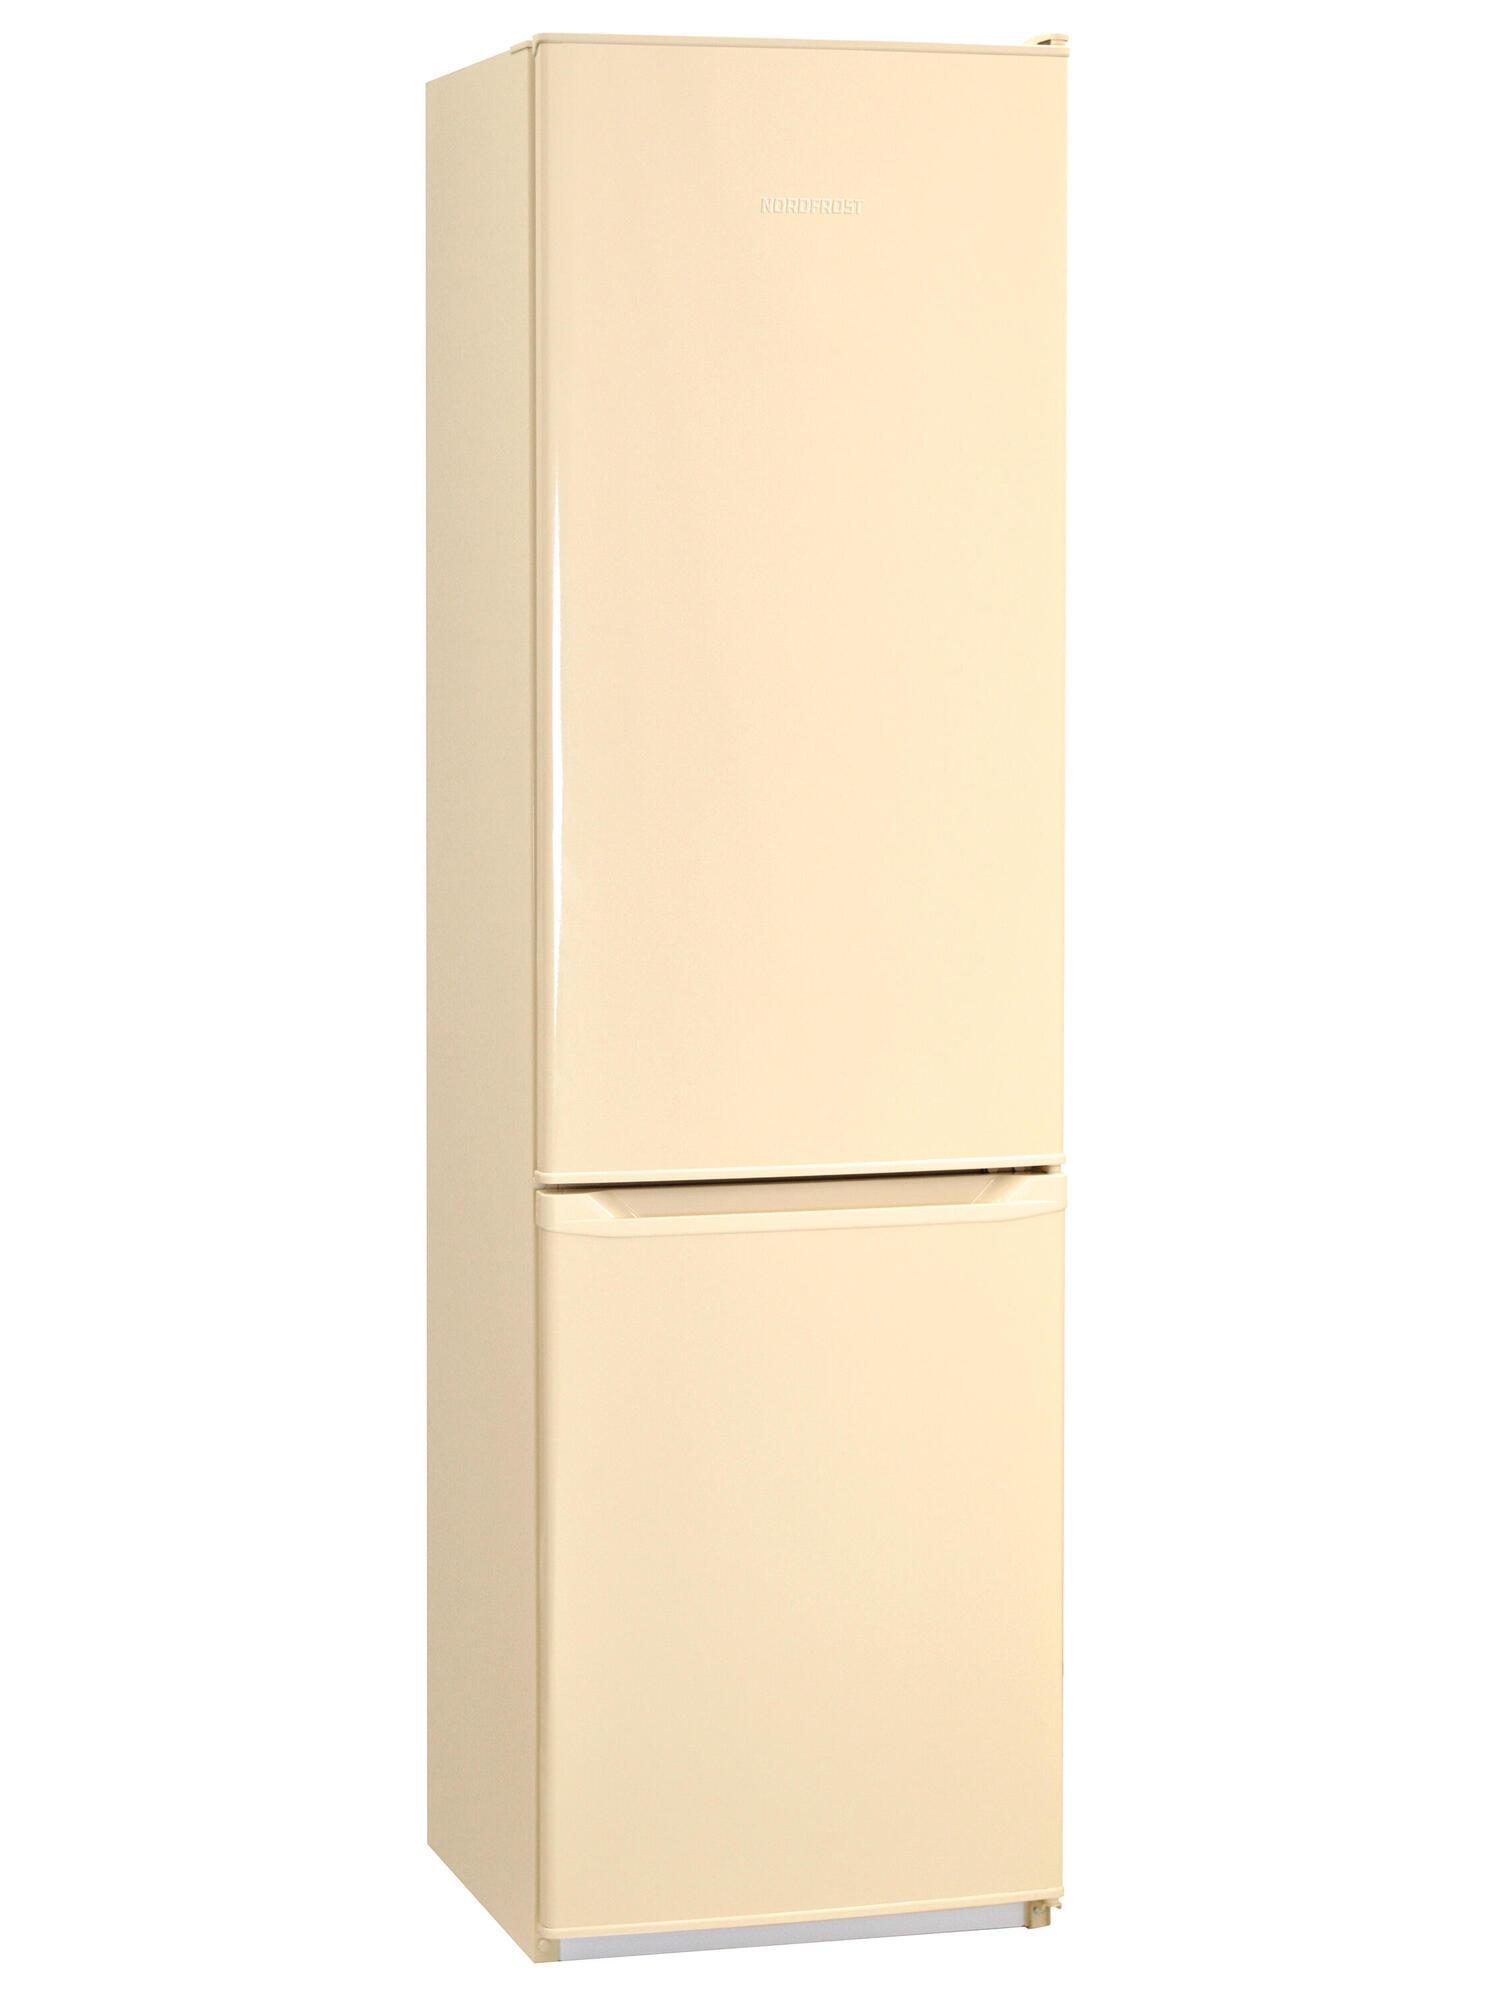 Холодильник NORDFROST NRB 154NF-732